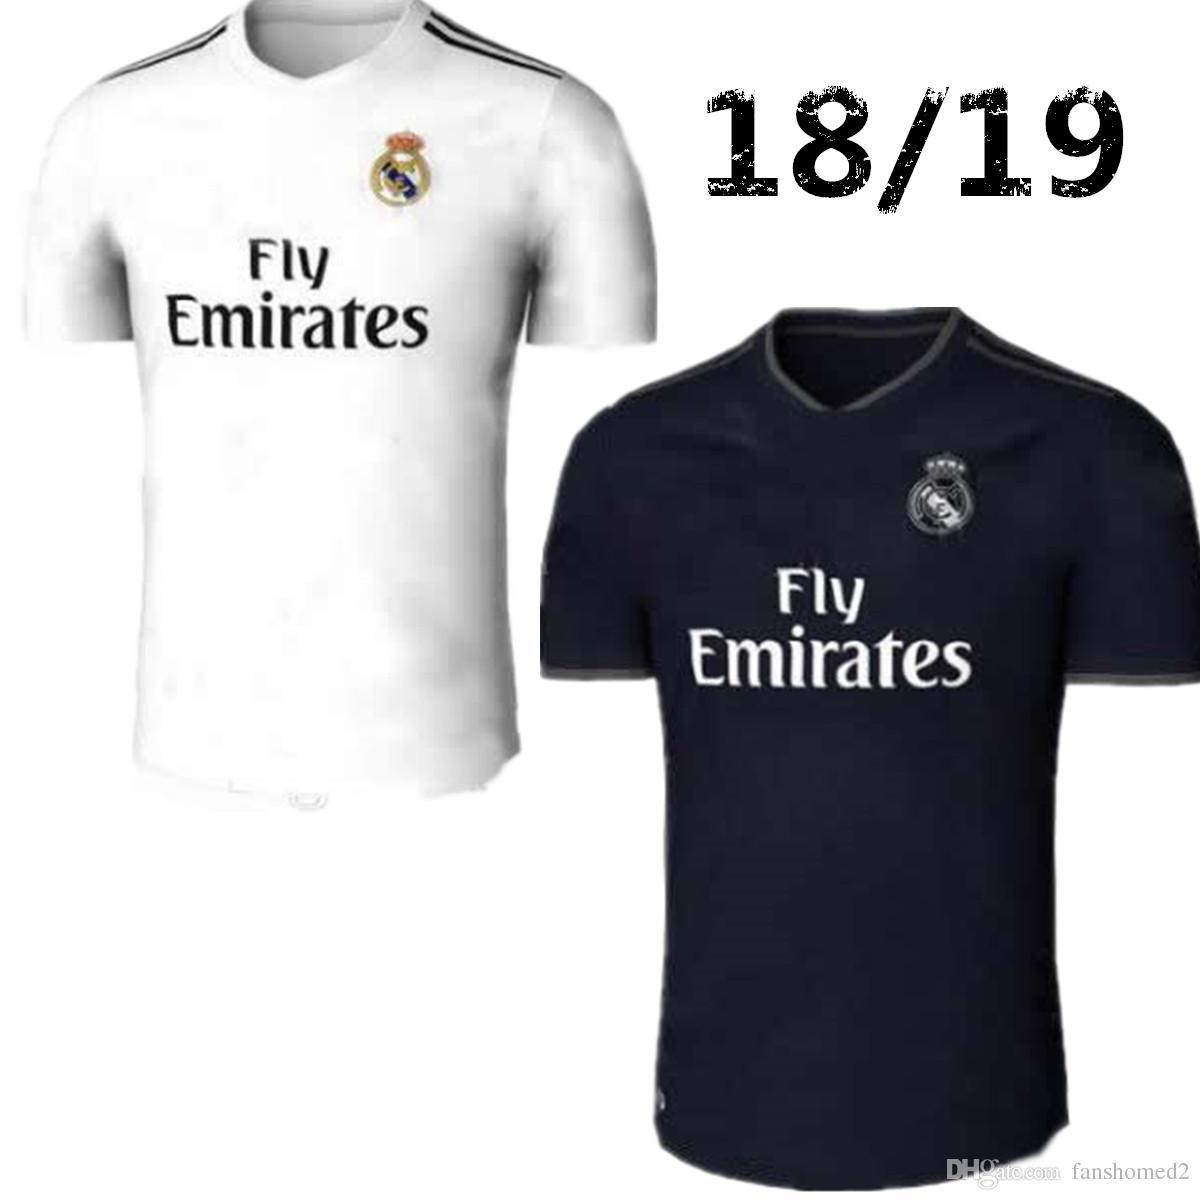 Compre 18 19 Real Madrid Camisas De Futebol Longe De Casa Romaldo 2018 2019  BALE ASENSIO MARCELO KROOS ISCO BENZEMA Camisa De Futebol Camisas De  Futebol De ... 783d0a387a5f4